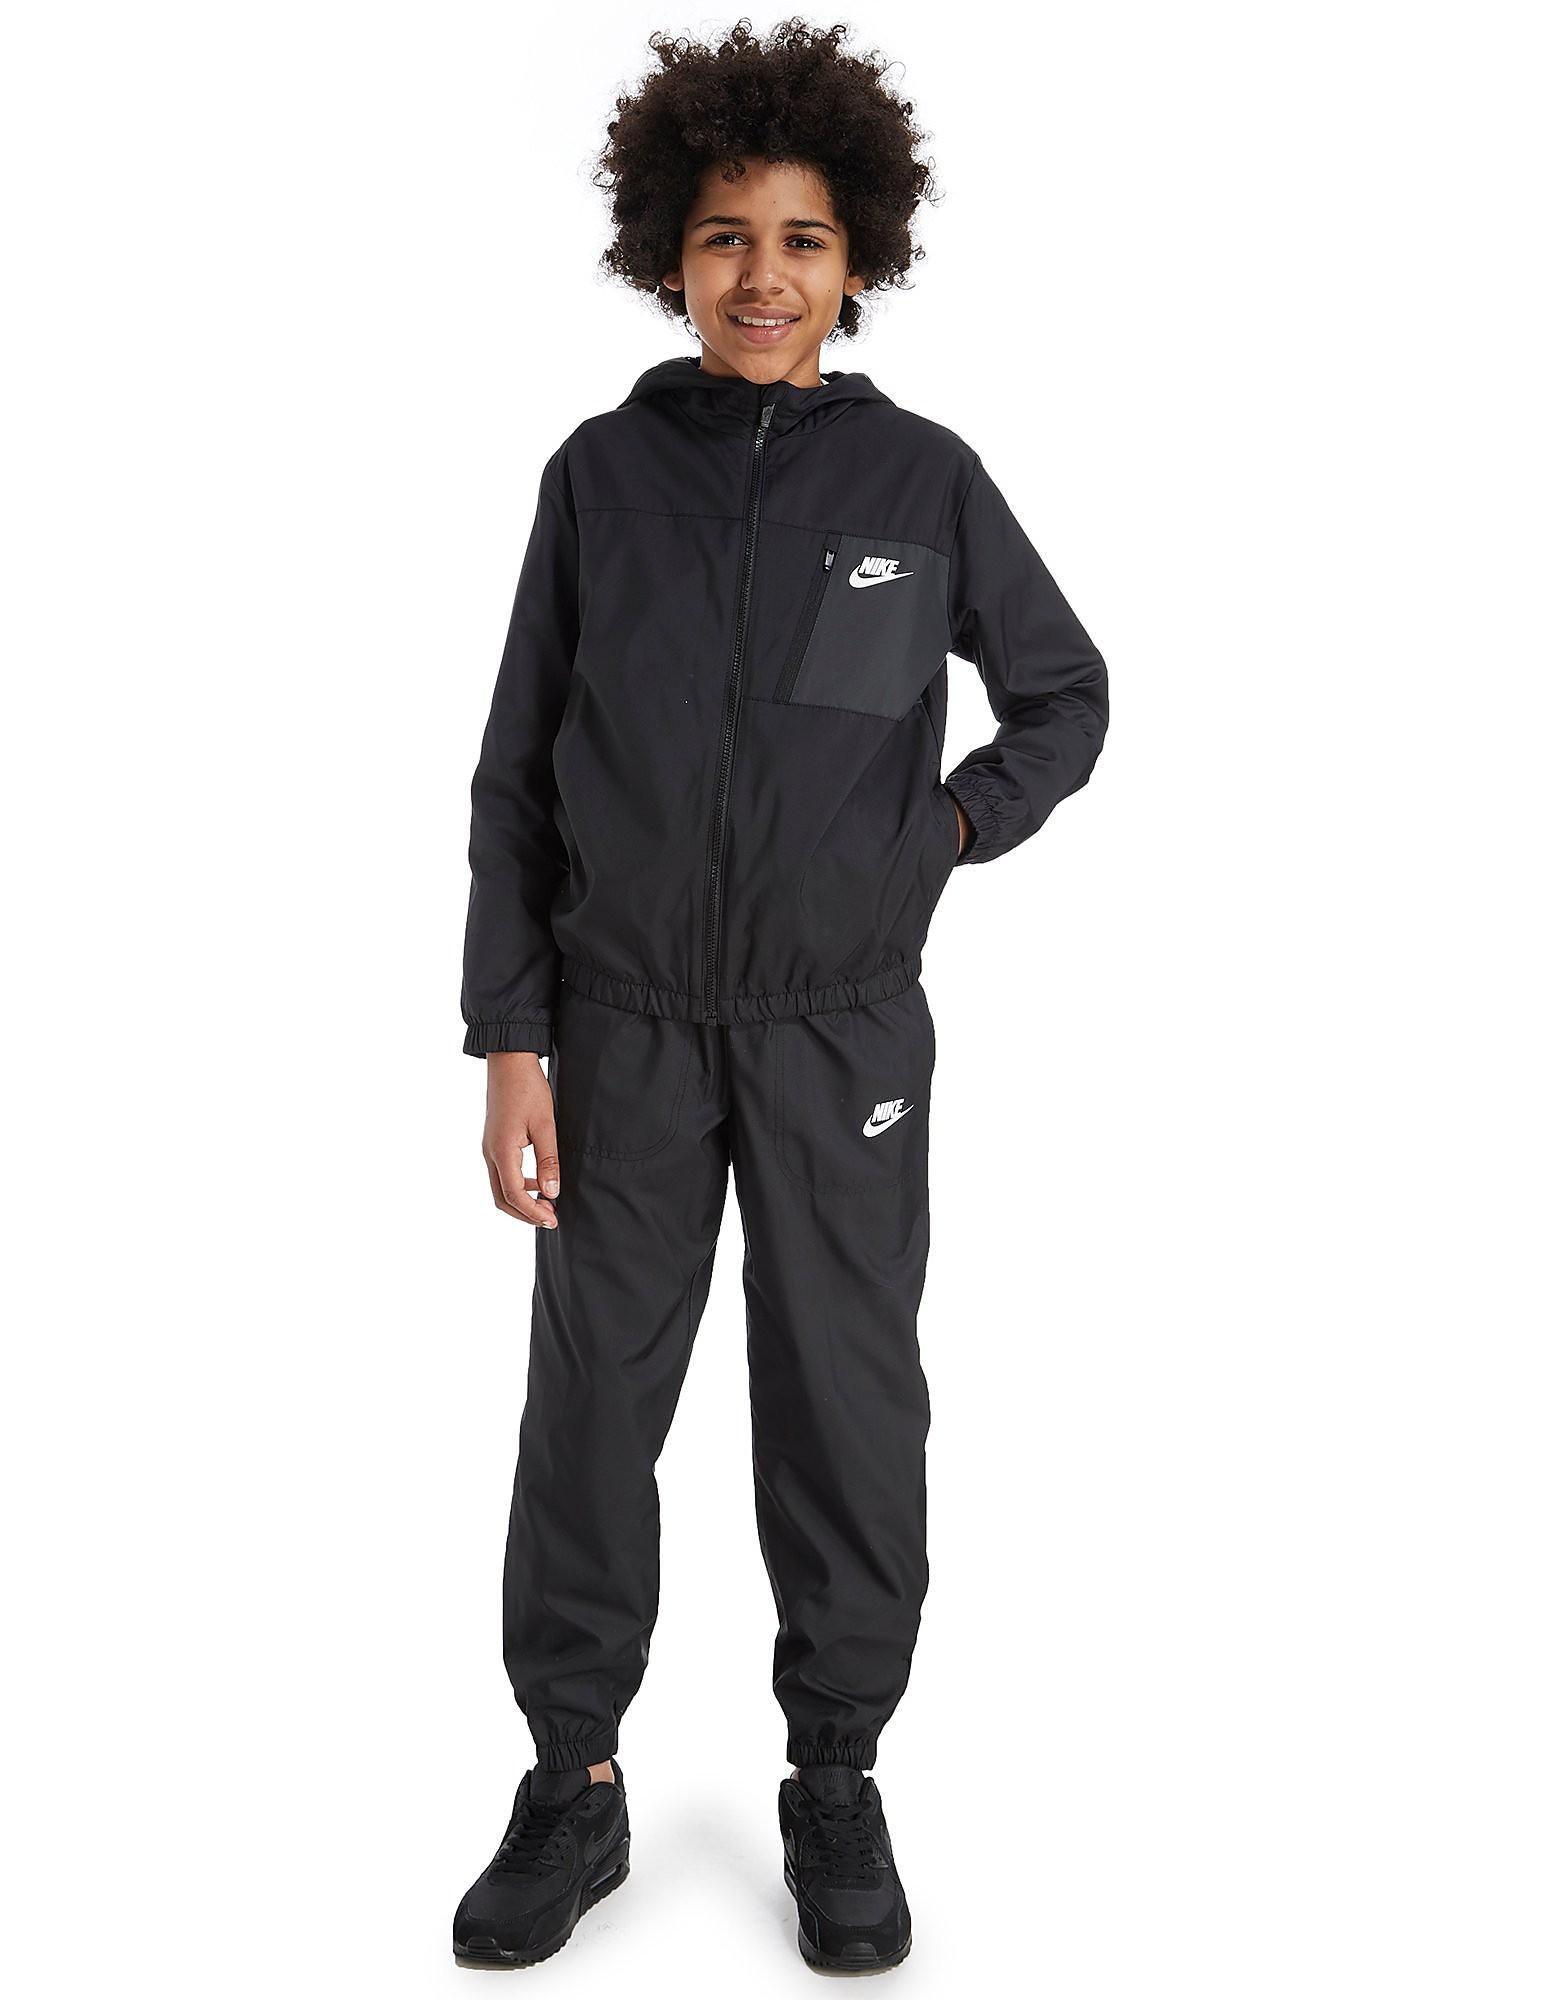 Nike Winger Woven Suit Junior